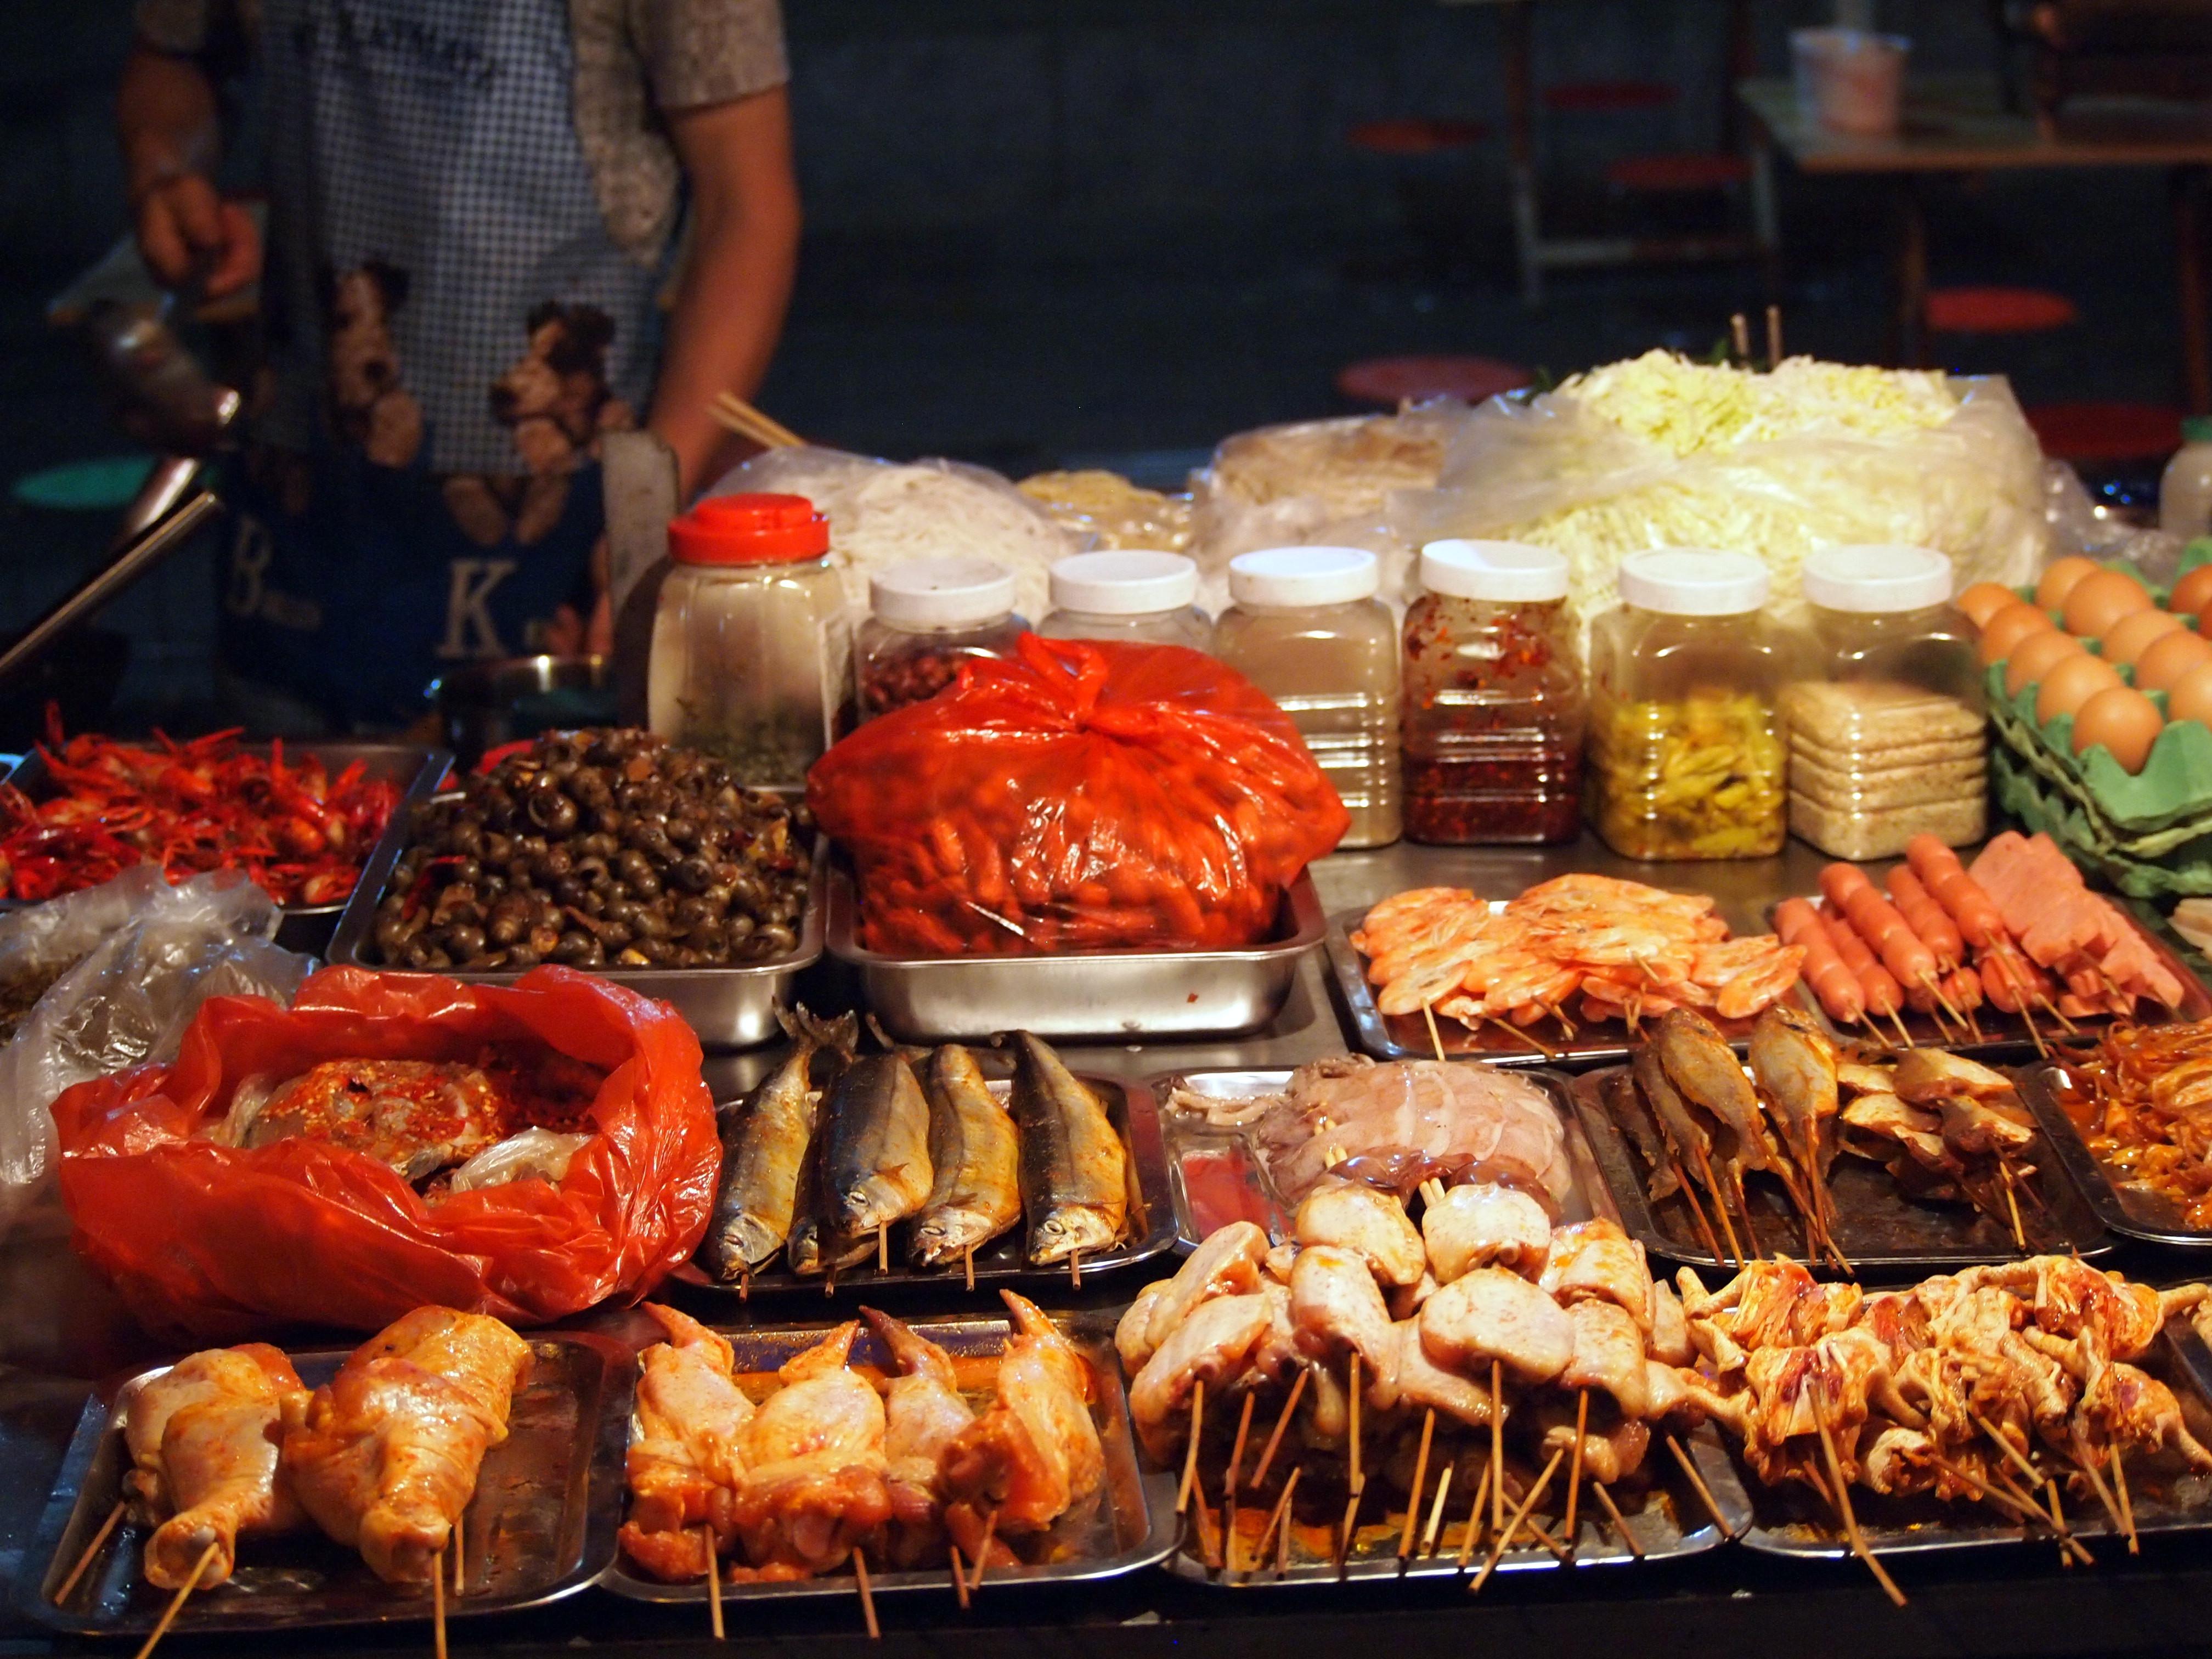 Night market food stall in Kunming.